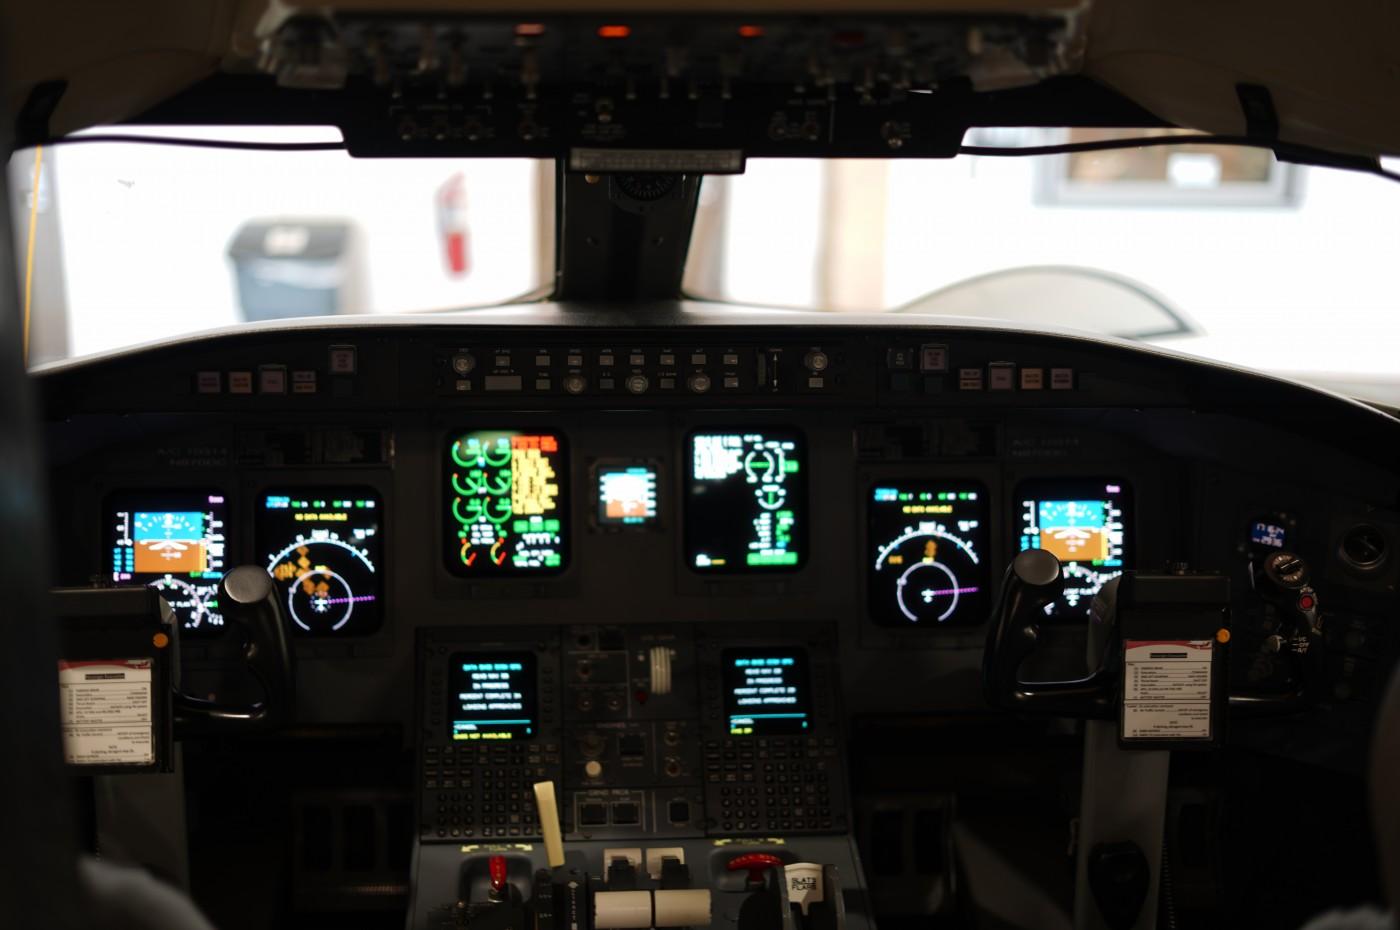 CRJ 700 Cockpit